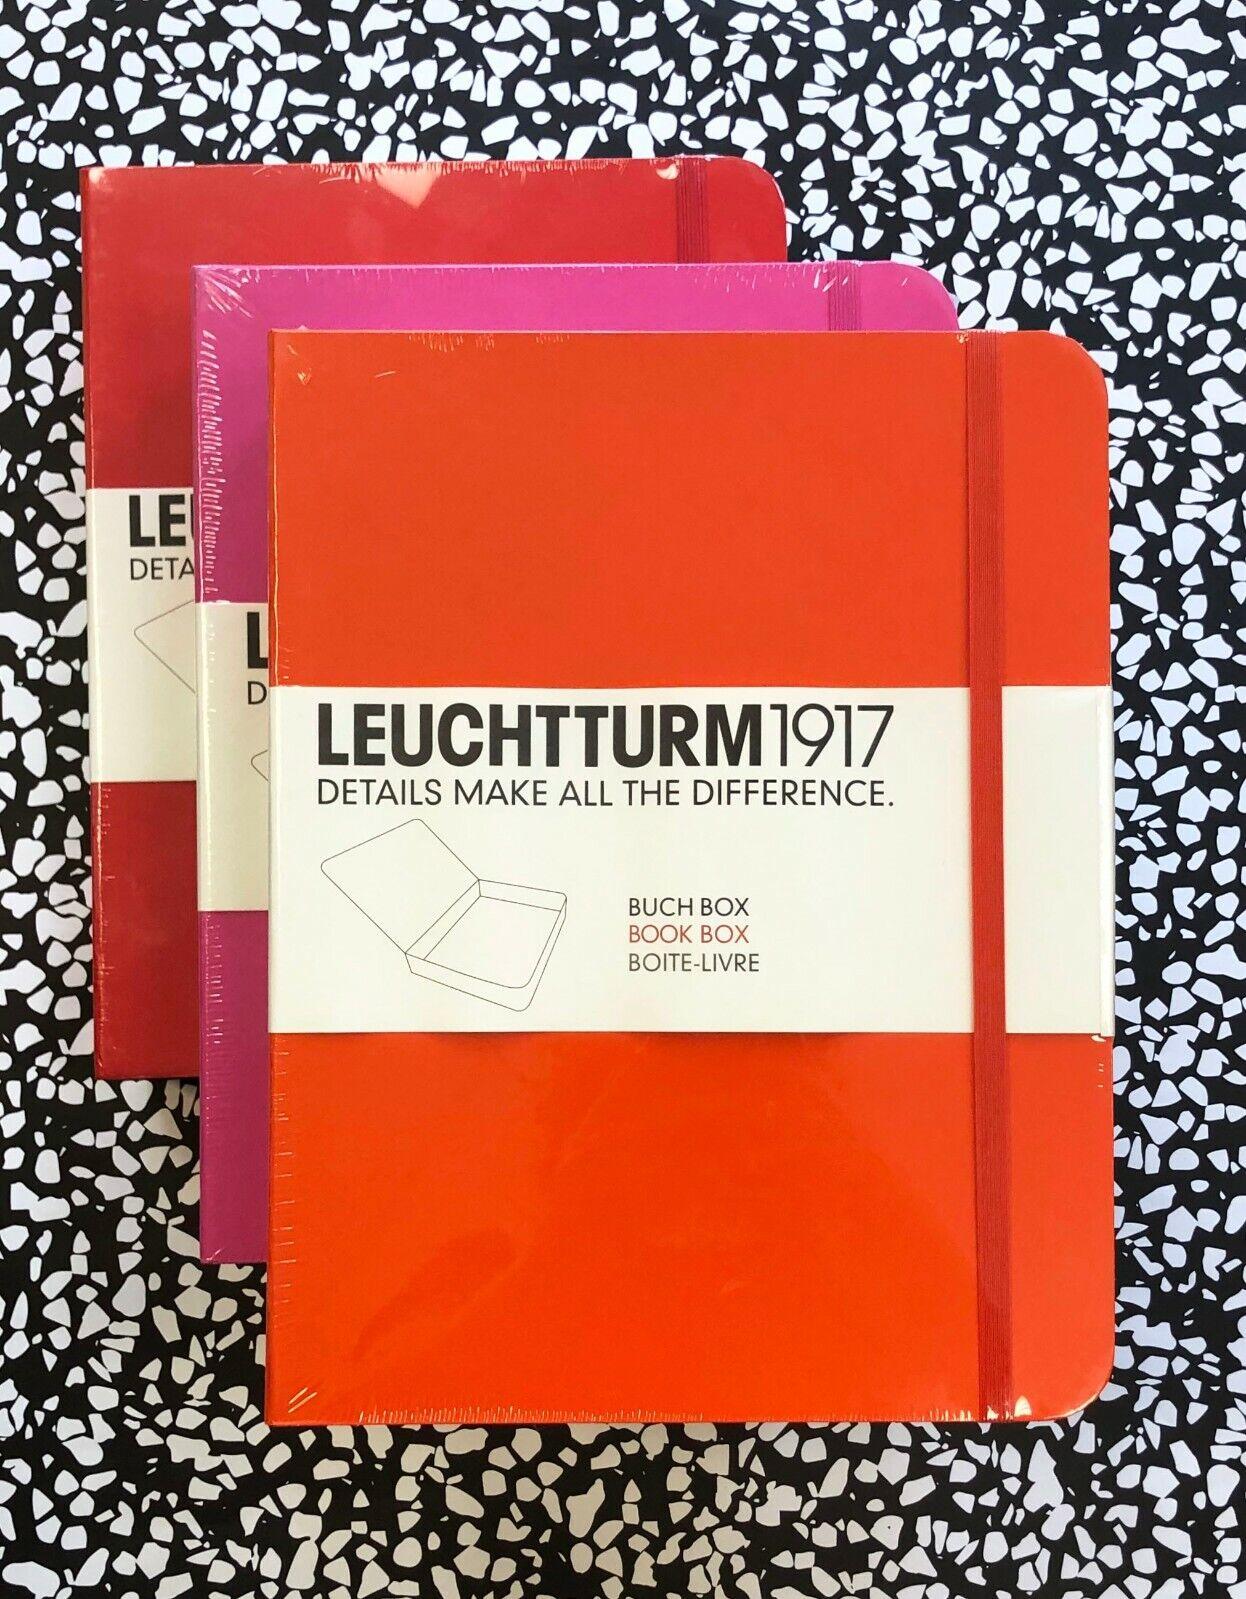 Brand New Leuchtturm Book Box -- great for office supplies o